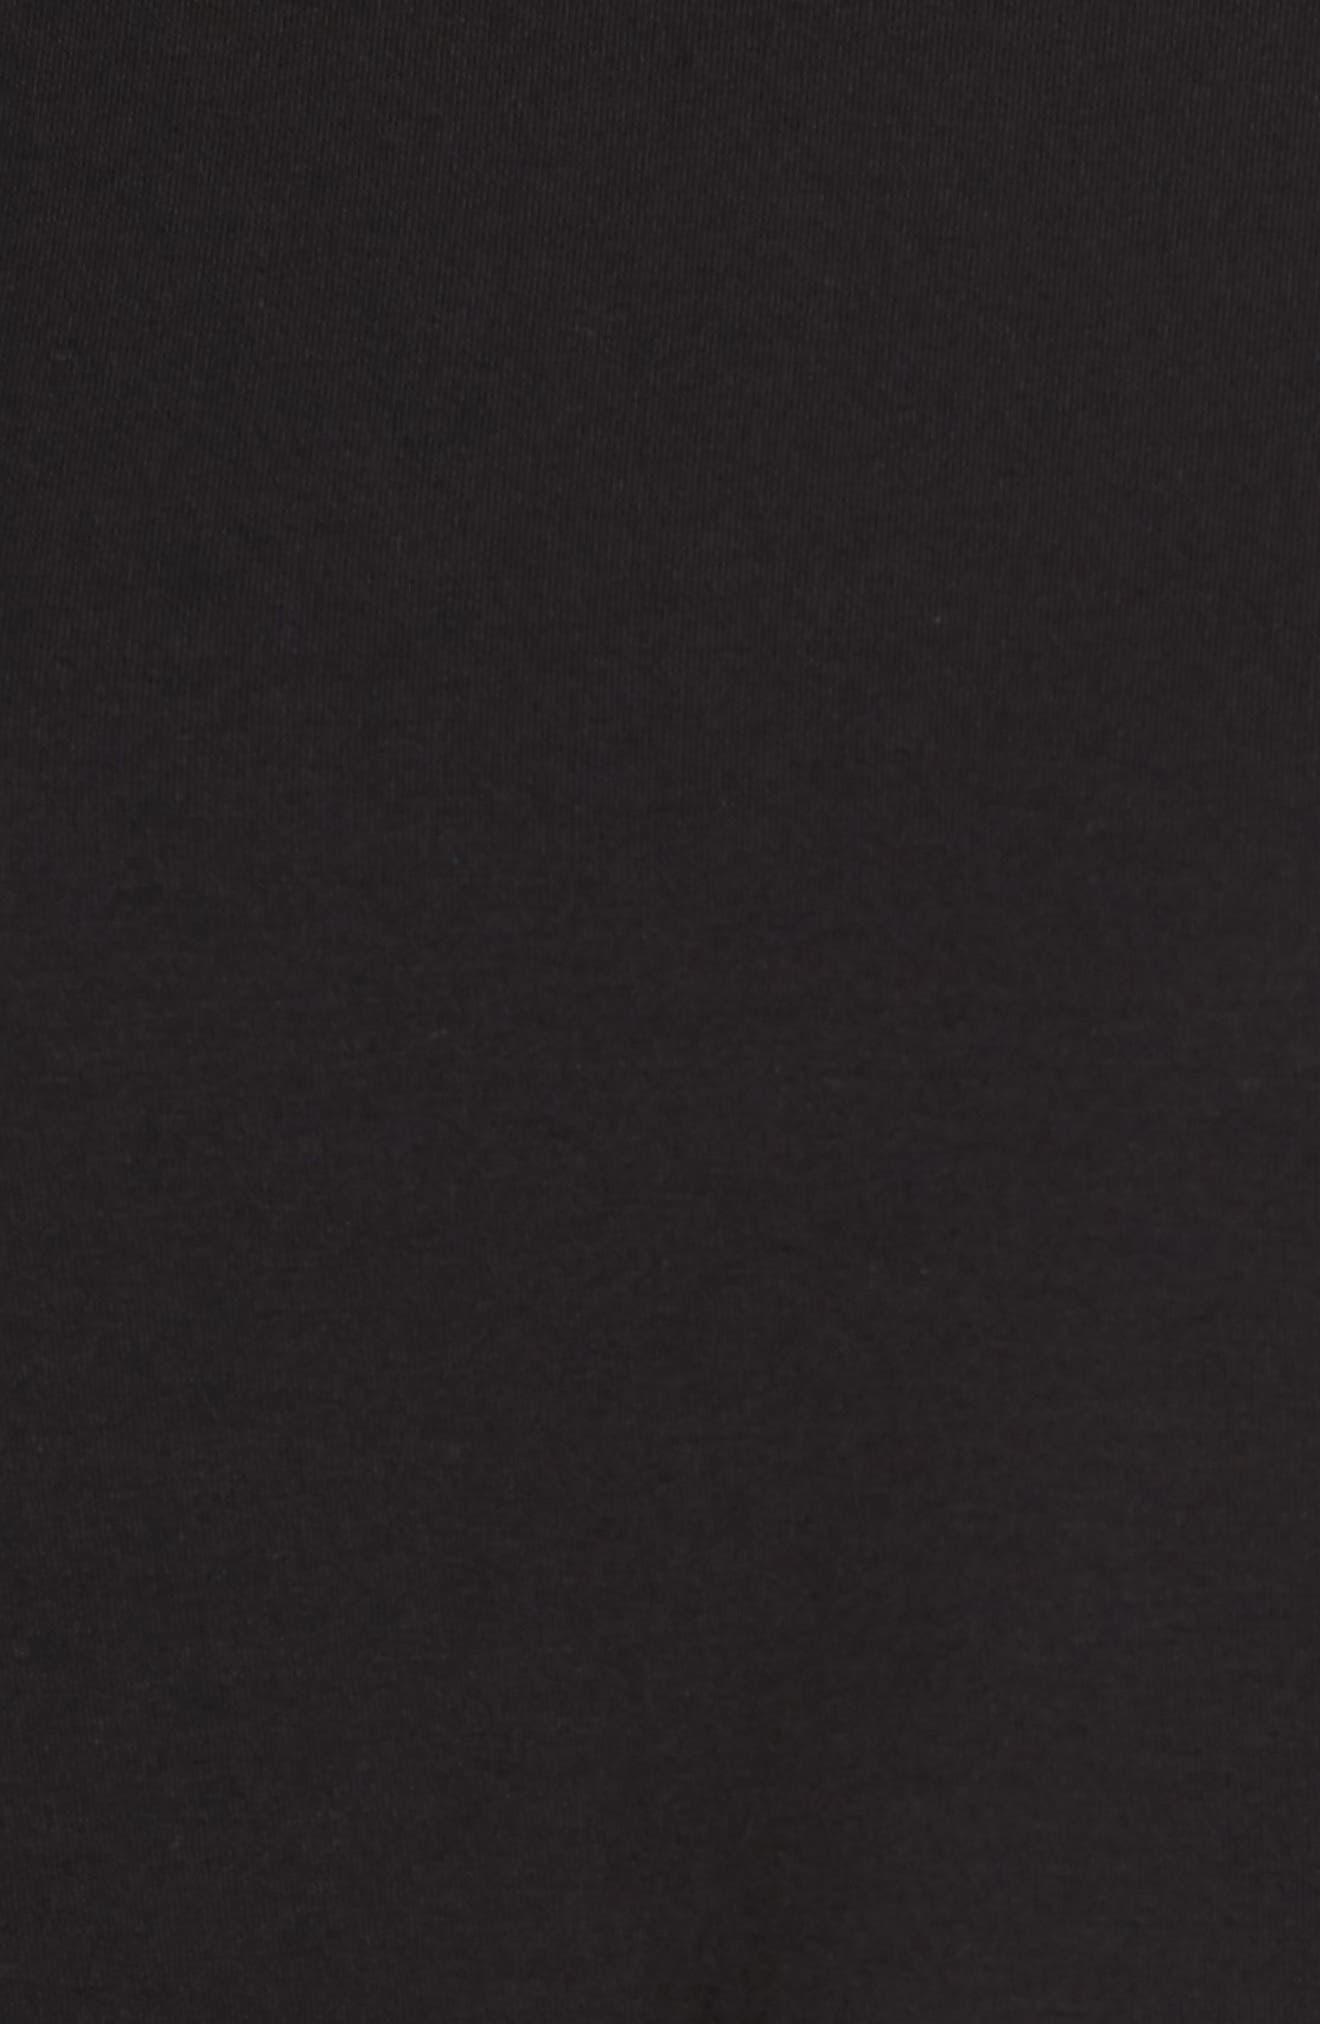 Mock Neck Top,                             Alternate thumbnail 5, color,                             Black